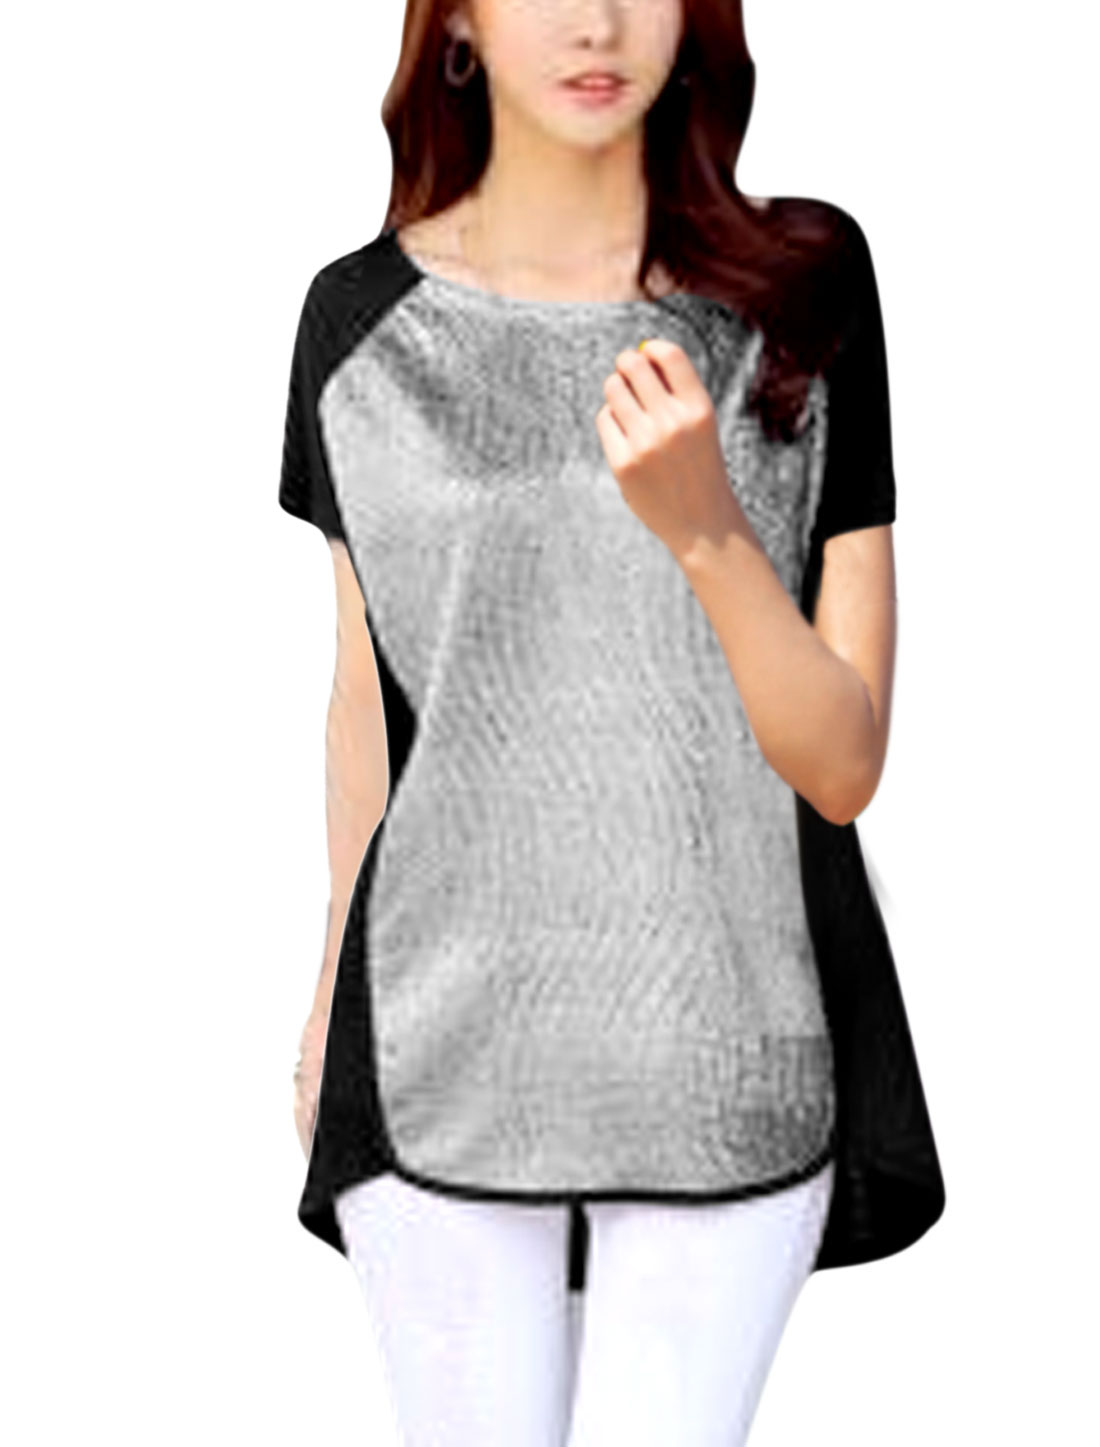 Ladies Short Sleeve Round Neck Color Block Tunic Top Black Silver Tone S